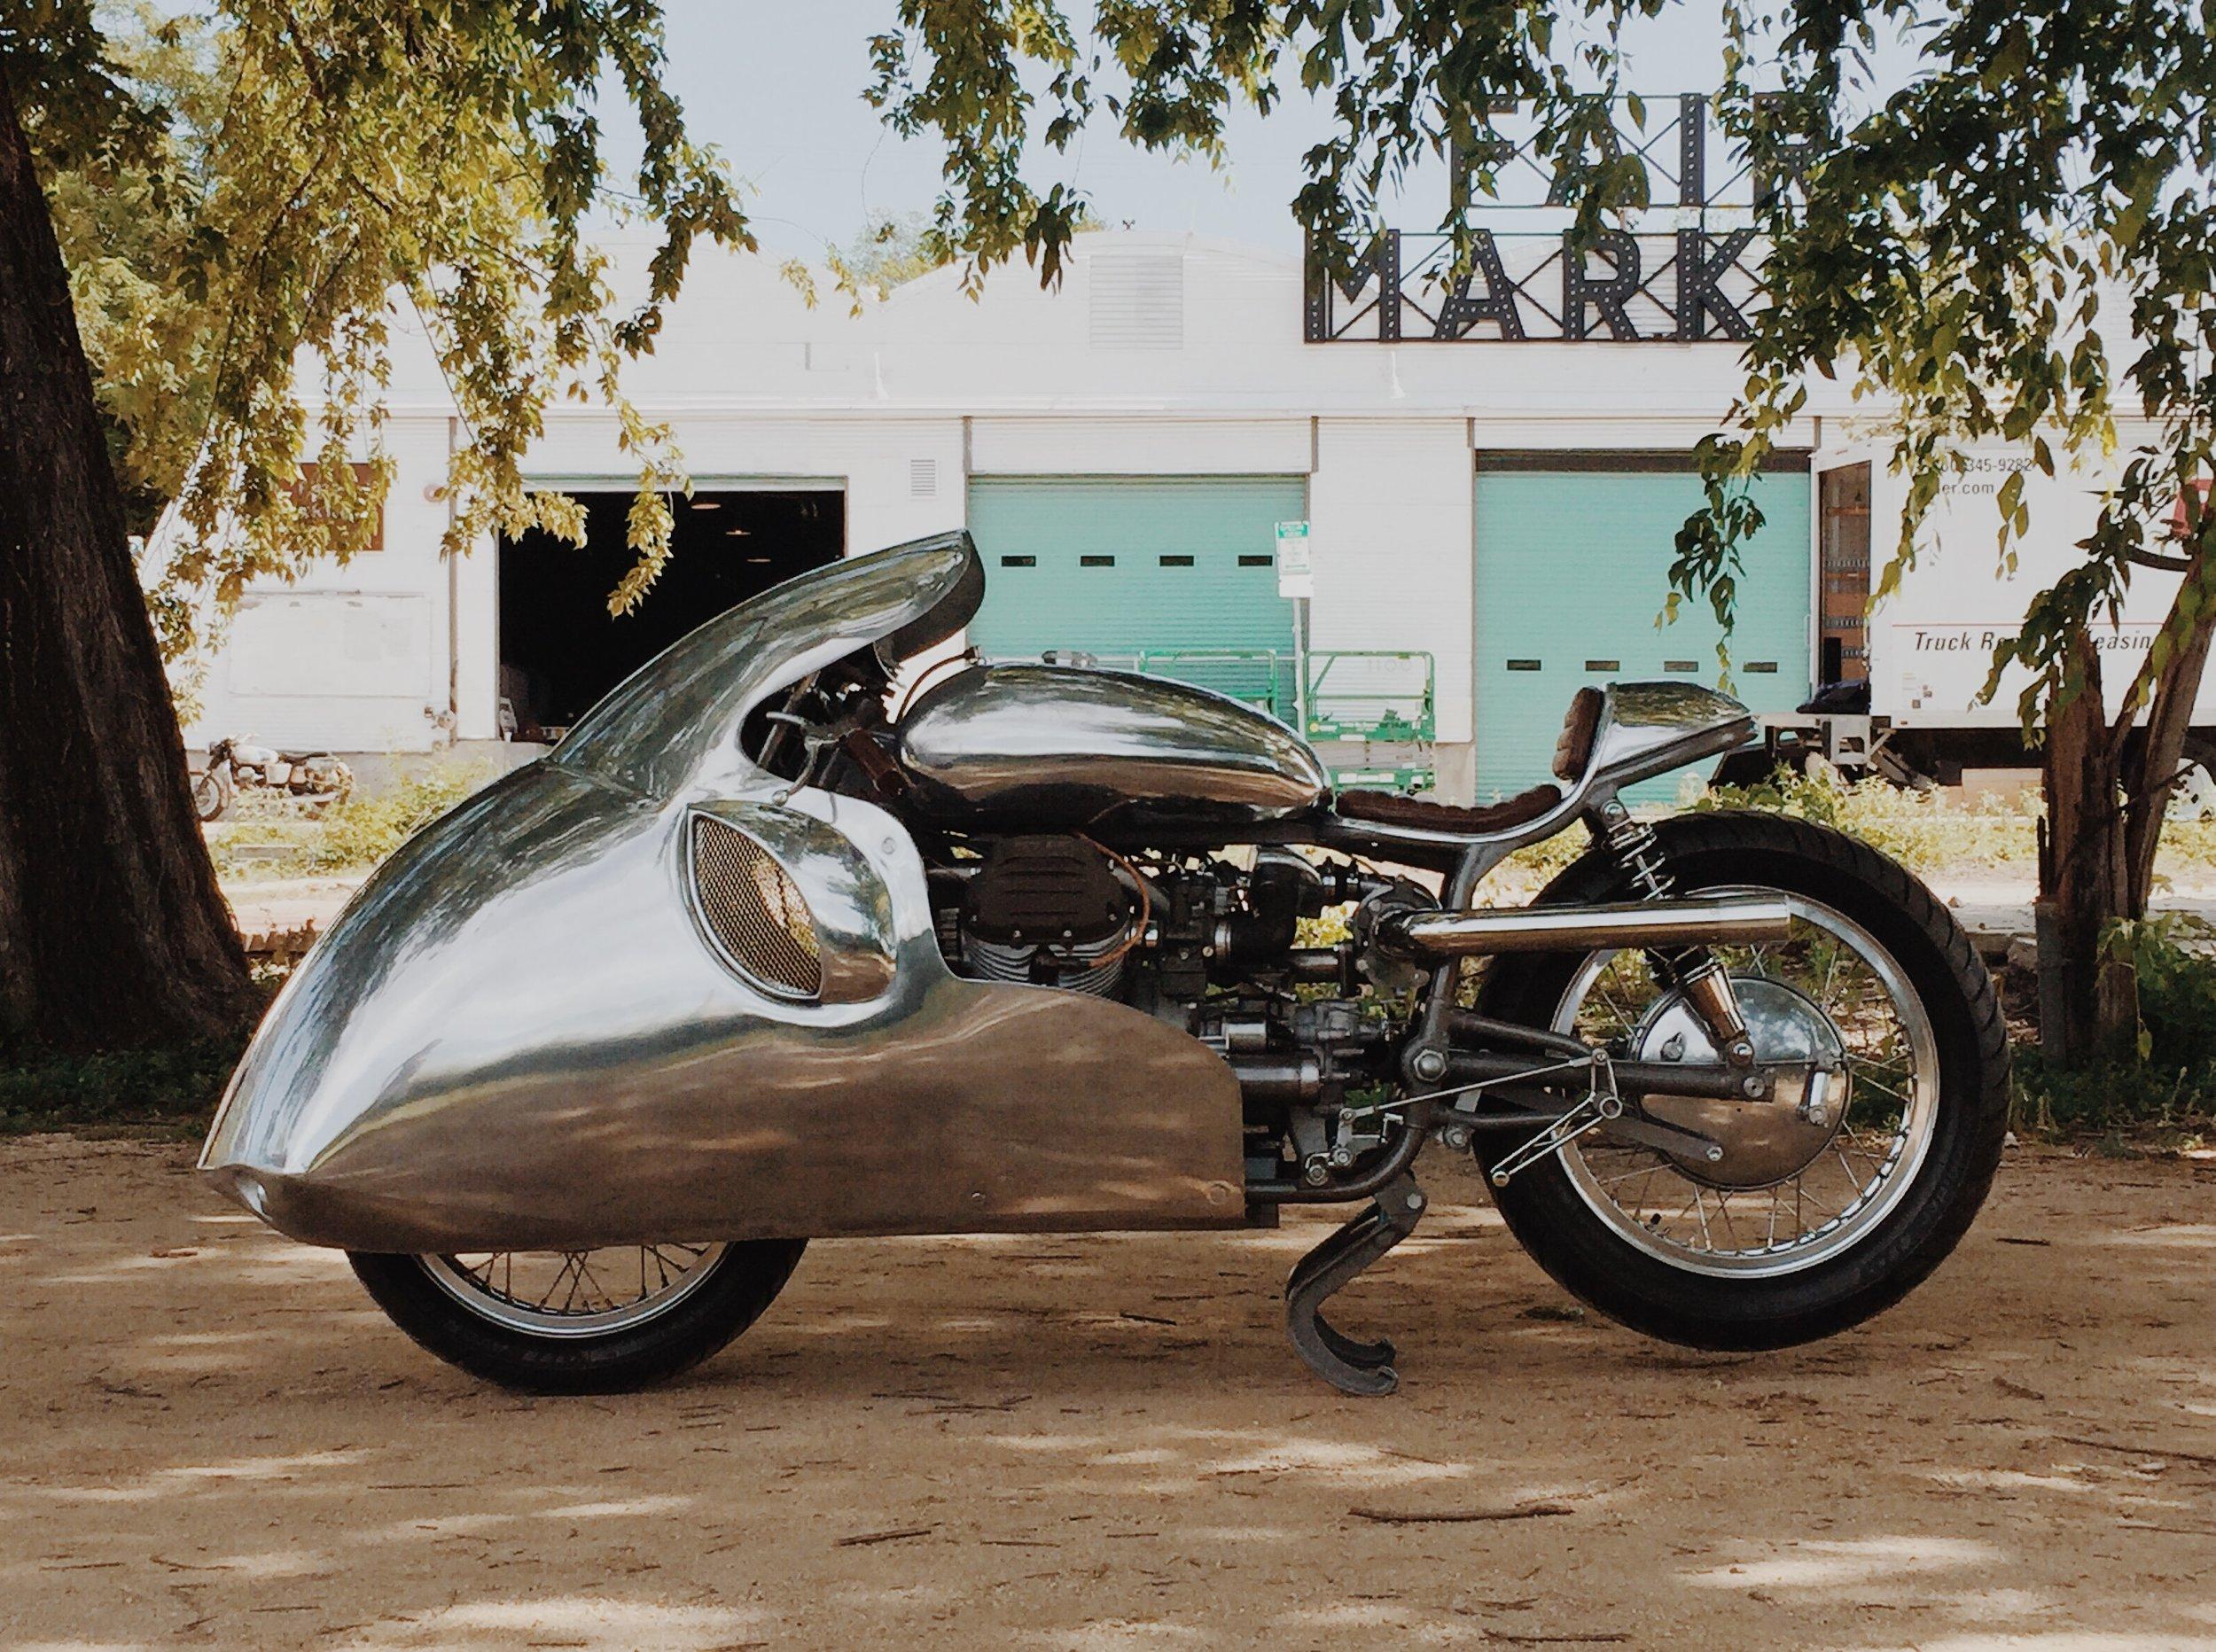 Craig_Rodsmith_Turbo_Moto-Guzzi_Dustbin_Moto-Mucci 1.jpg